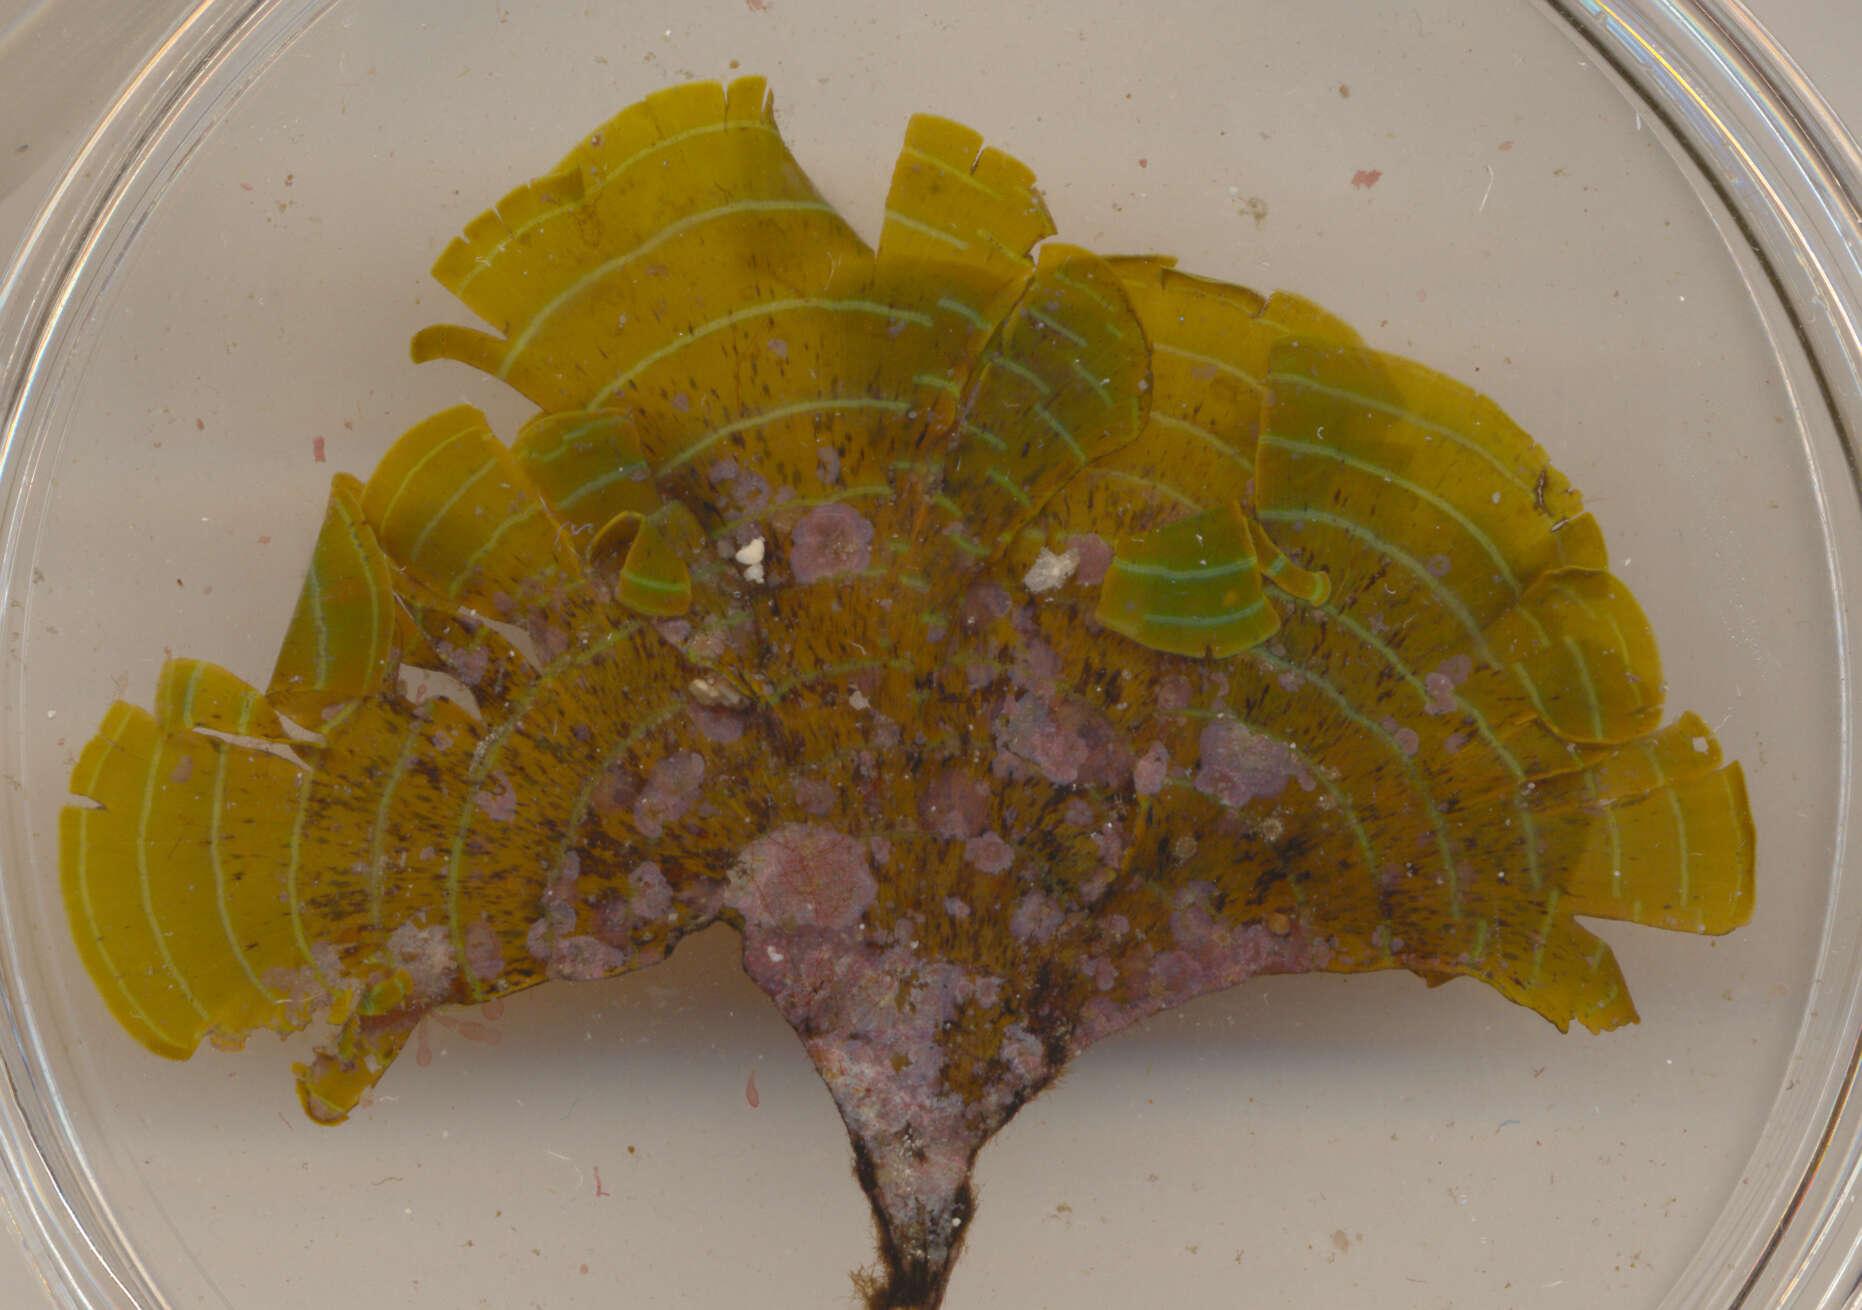 Image of SAR (Stramenopiles, Alveolates, Rhizaria)